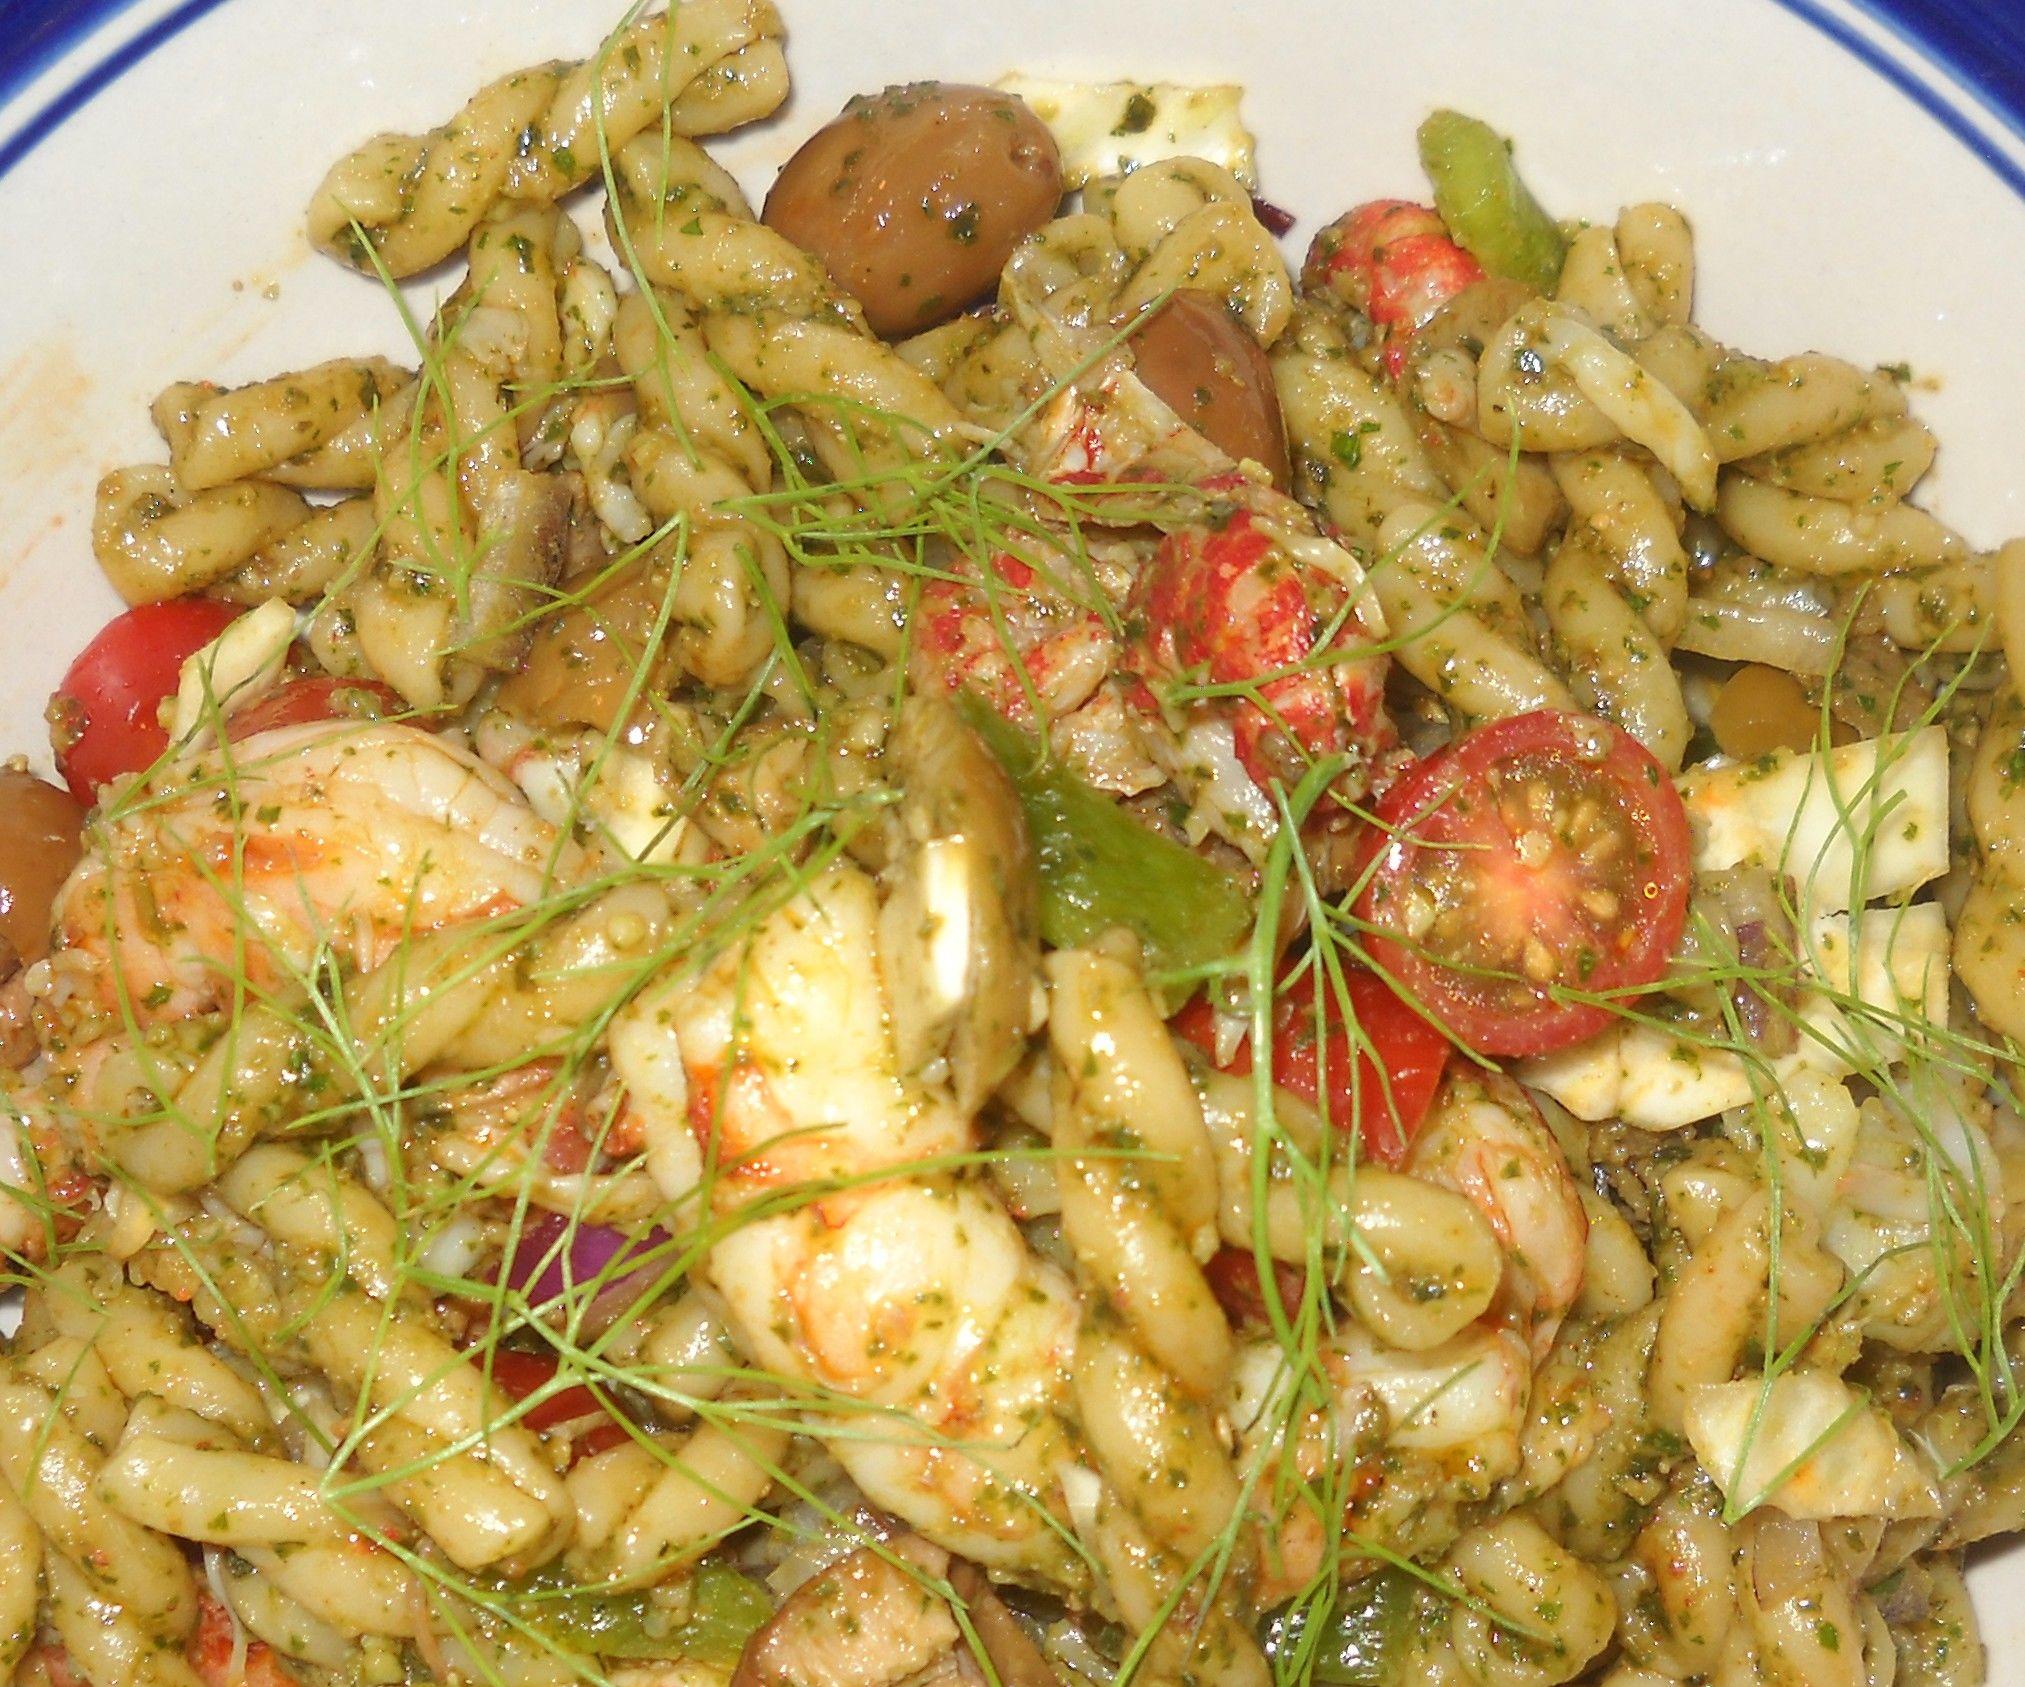 Pesto Alla Penne With Shrimp, Crayfish & Fennel